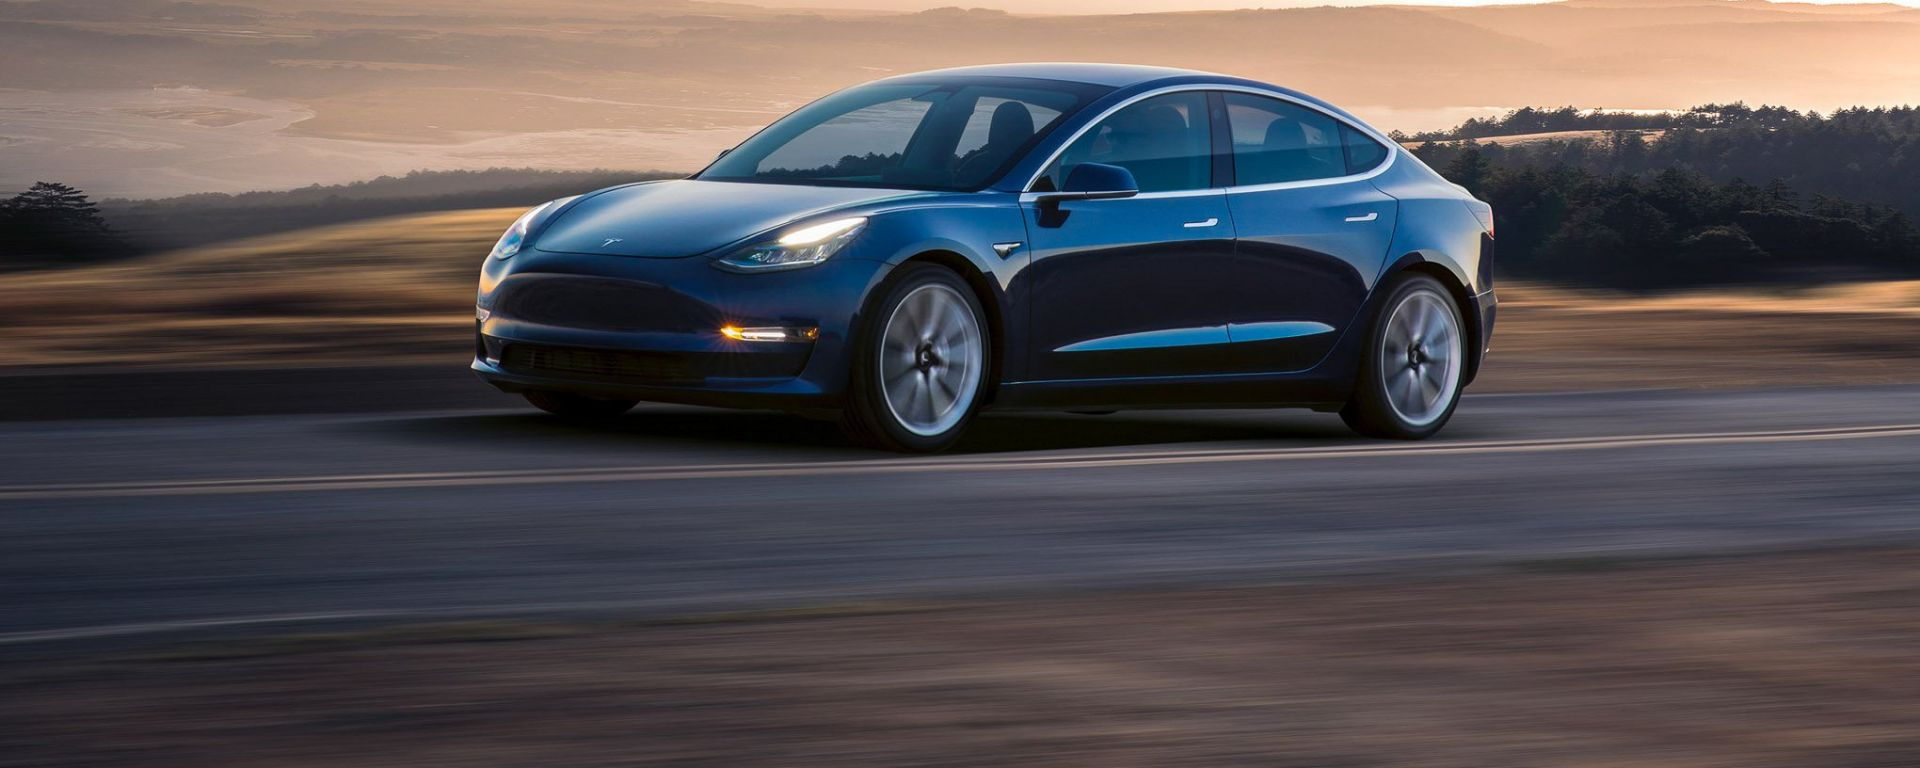 Tesla Model 3 alle prese con la ruggine